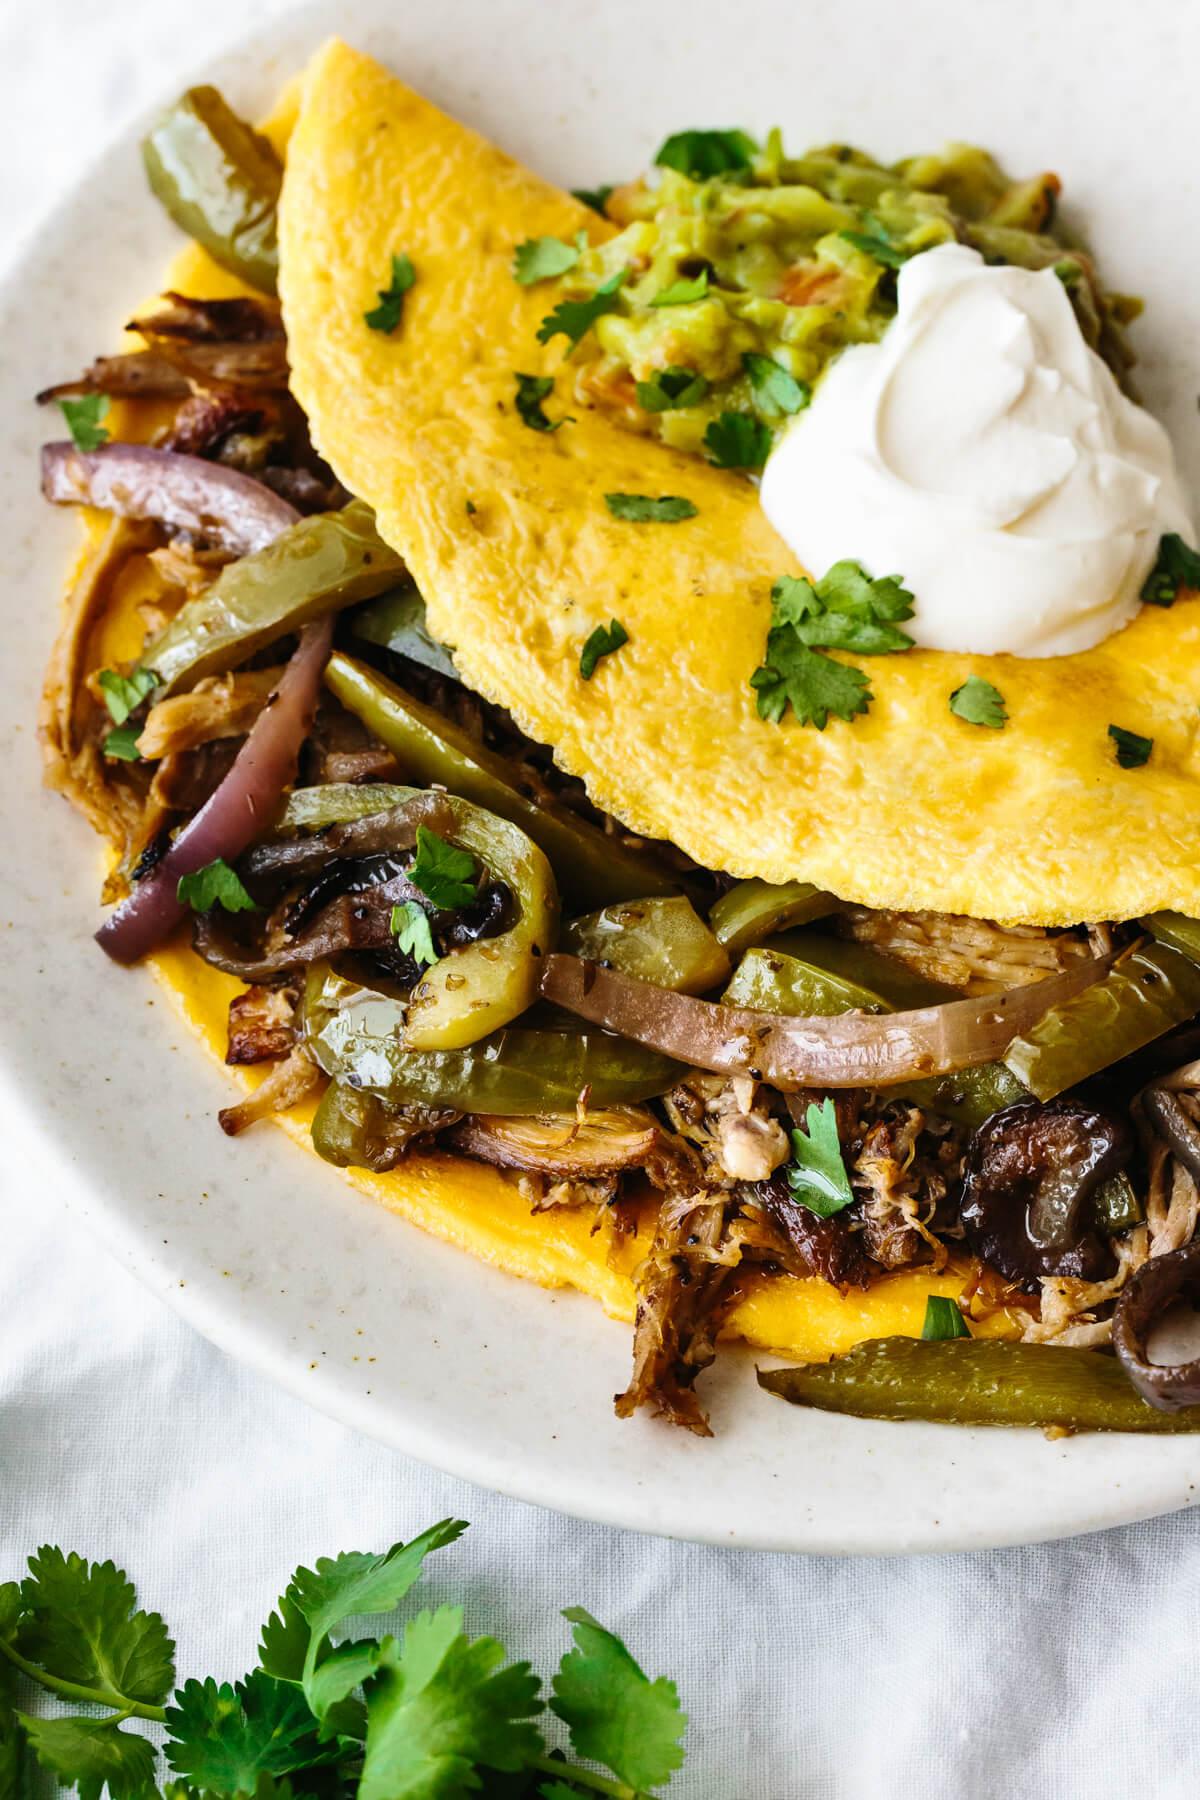 A plate of carnitas omelette with fajita veggies and sour cream.